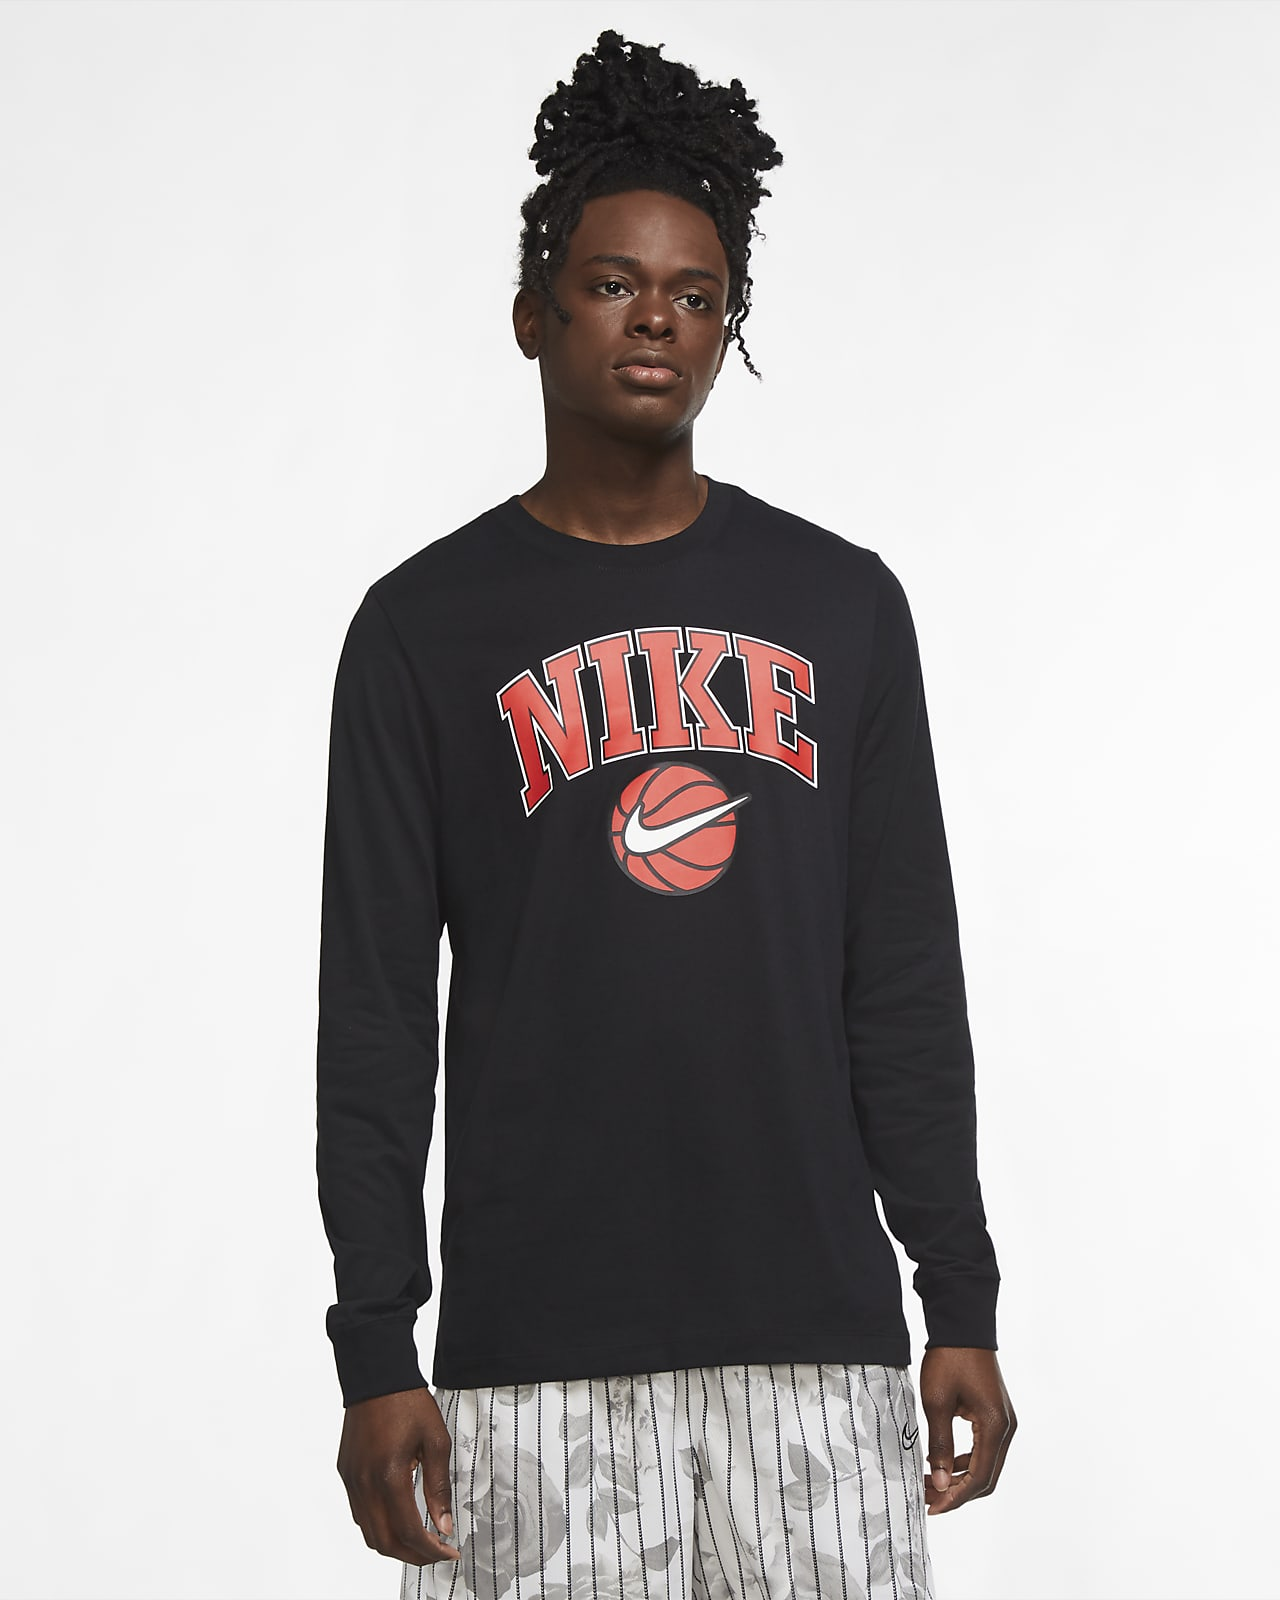 Nike Dri-FIT HBR Men's Basketball Long-Sleeve T-Shirt